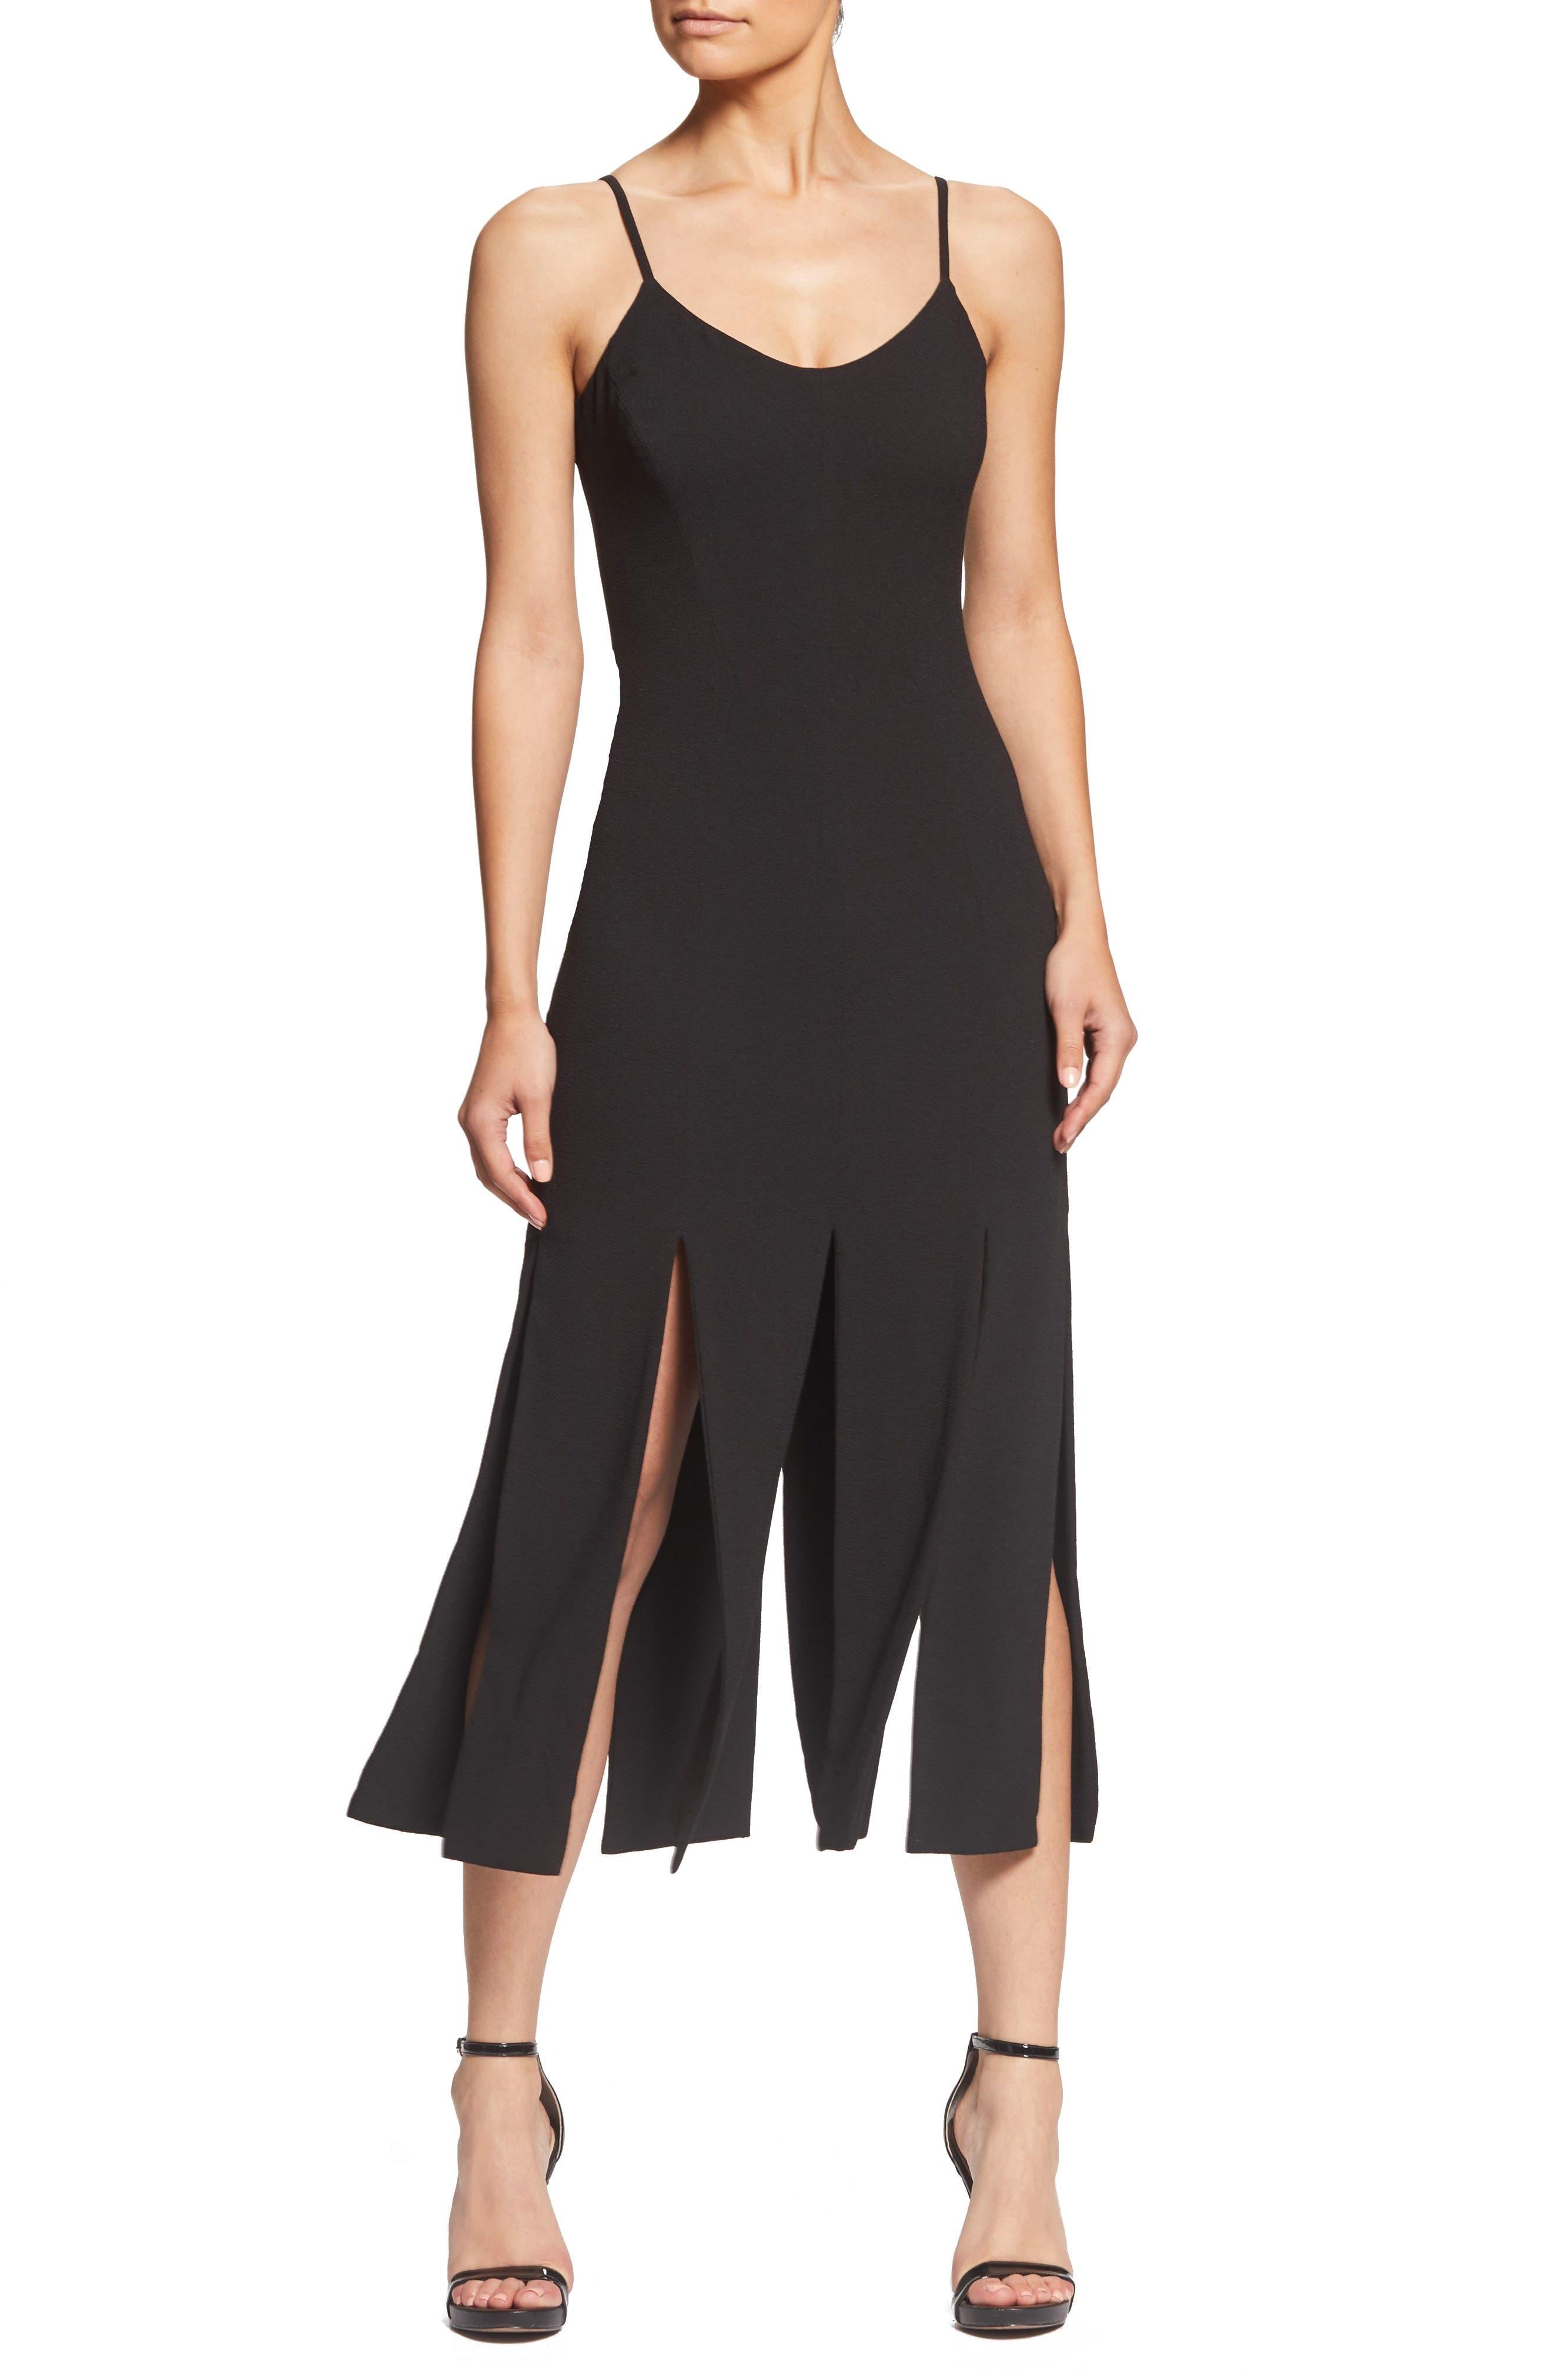 Devon Midi Dress,                         Main,                         color, BLACK